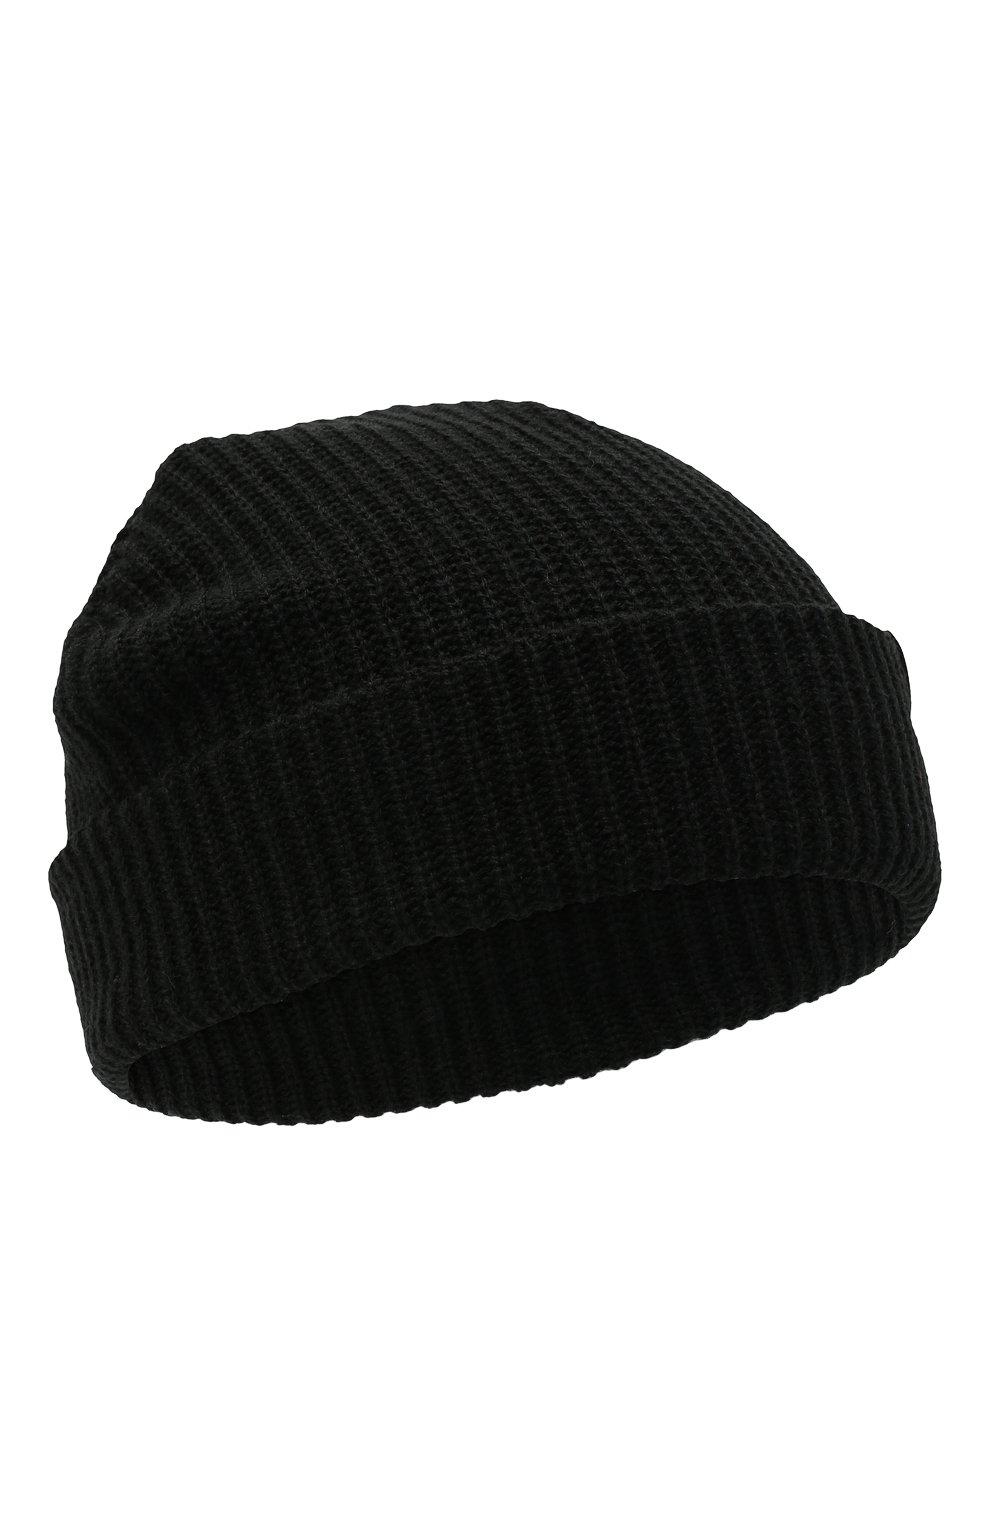 Мужская шапка HARLEY-DAVIDSON черного цвета, арт. 97601-21VM | Фото 1 (Материал: Текстиль, Синтетический материал; Кросс-КТ: Трикотаж)